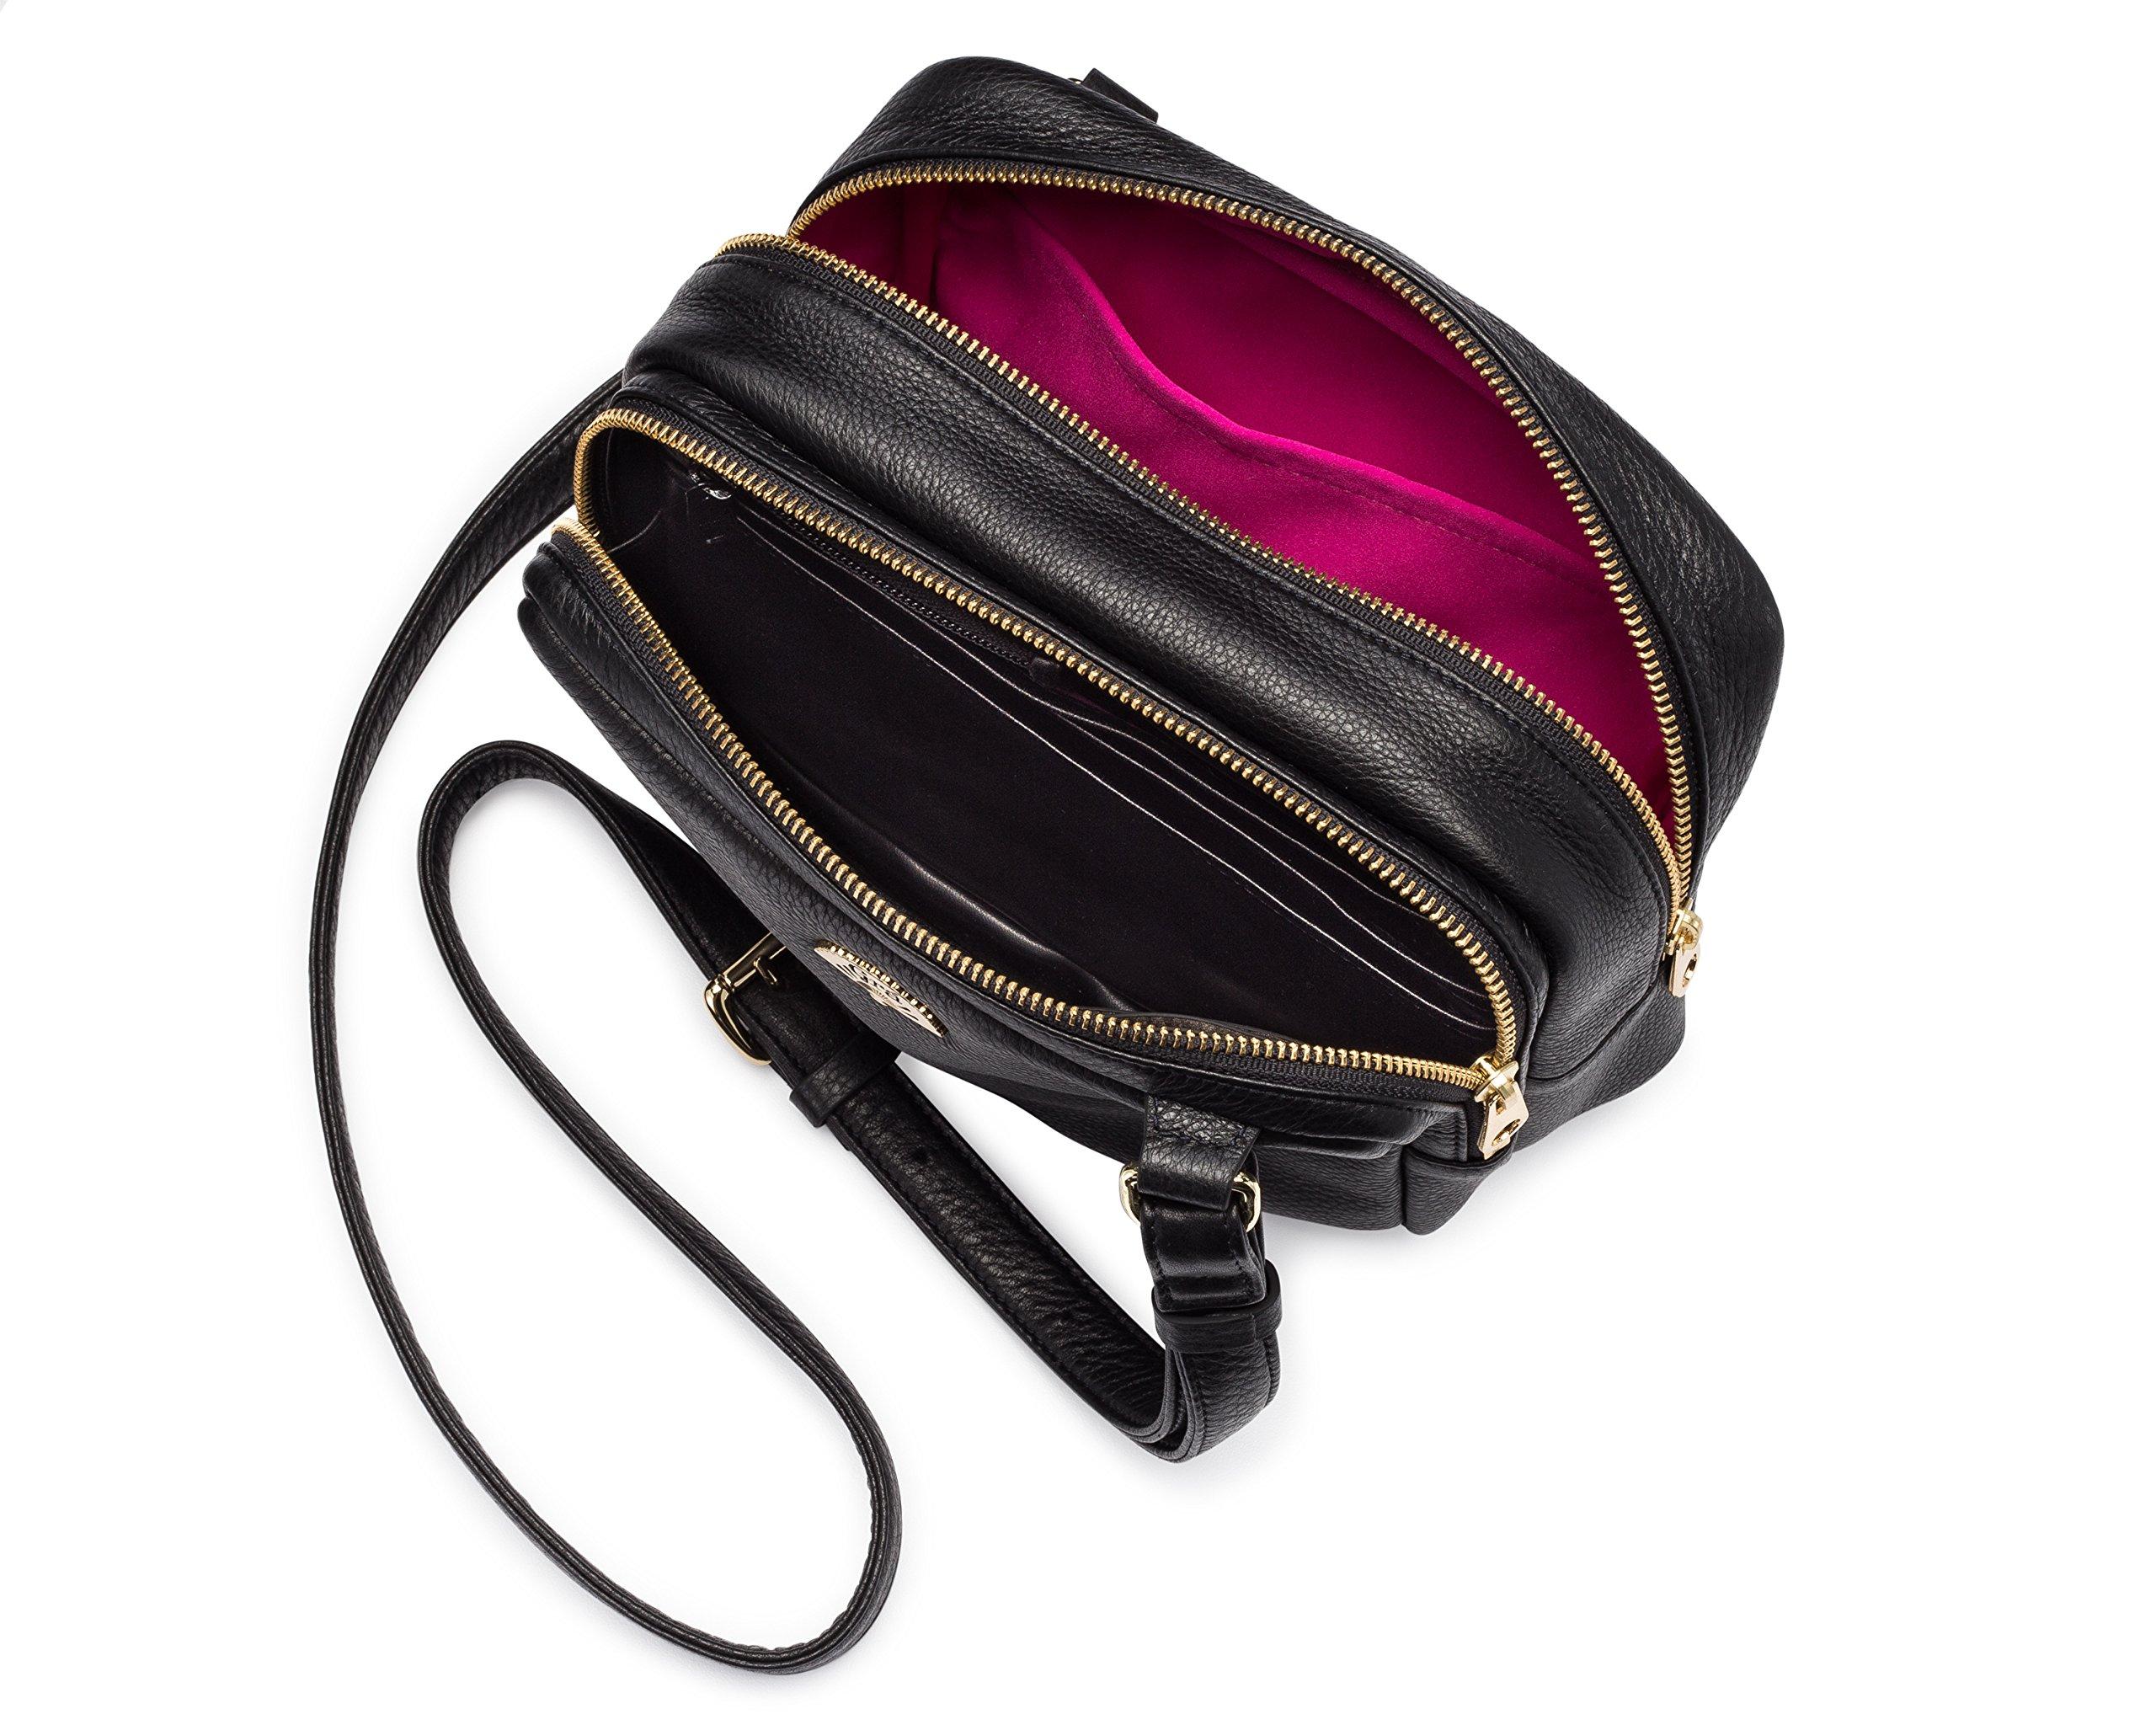 The Taisteal Cross Body Travel Bag by Gra Handbags (Image #1)